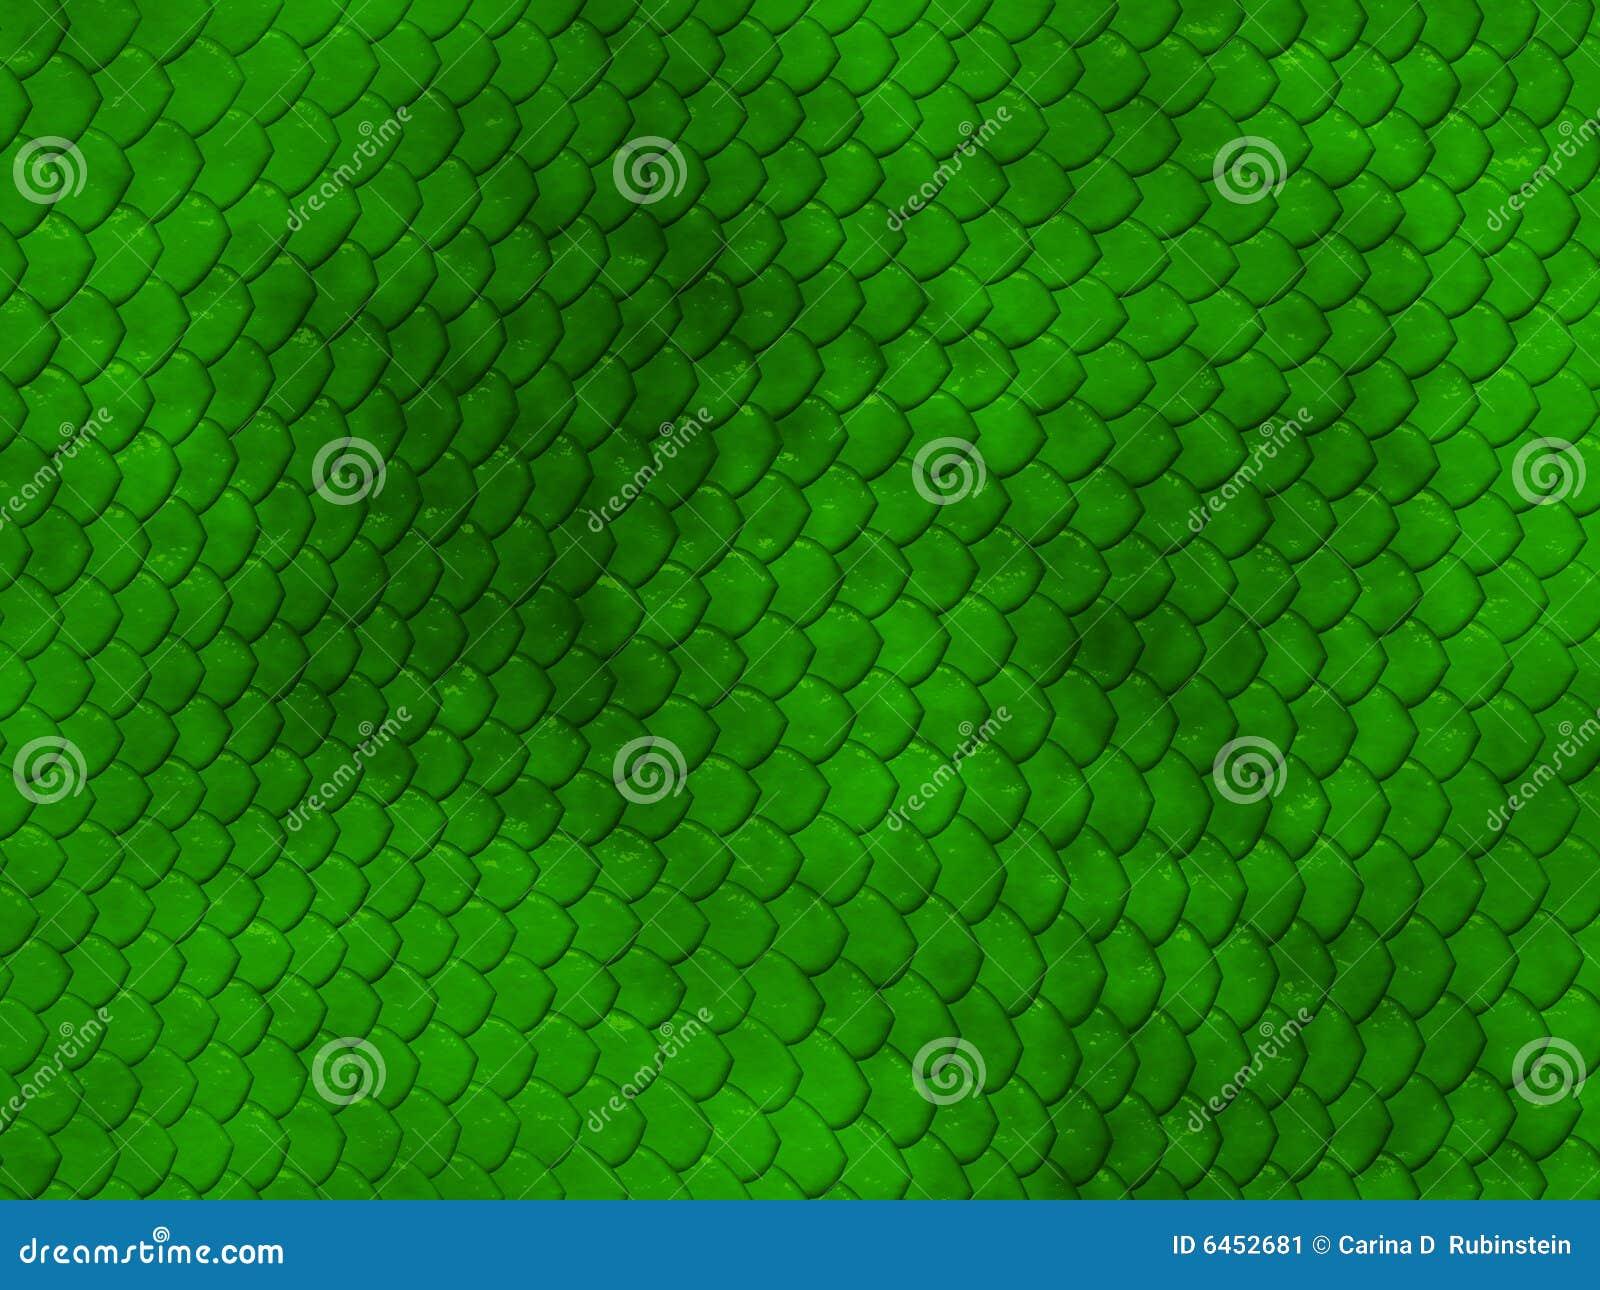 Zielona skóra węża konsystencja